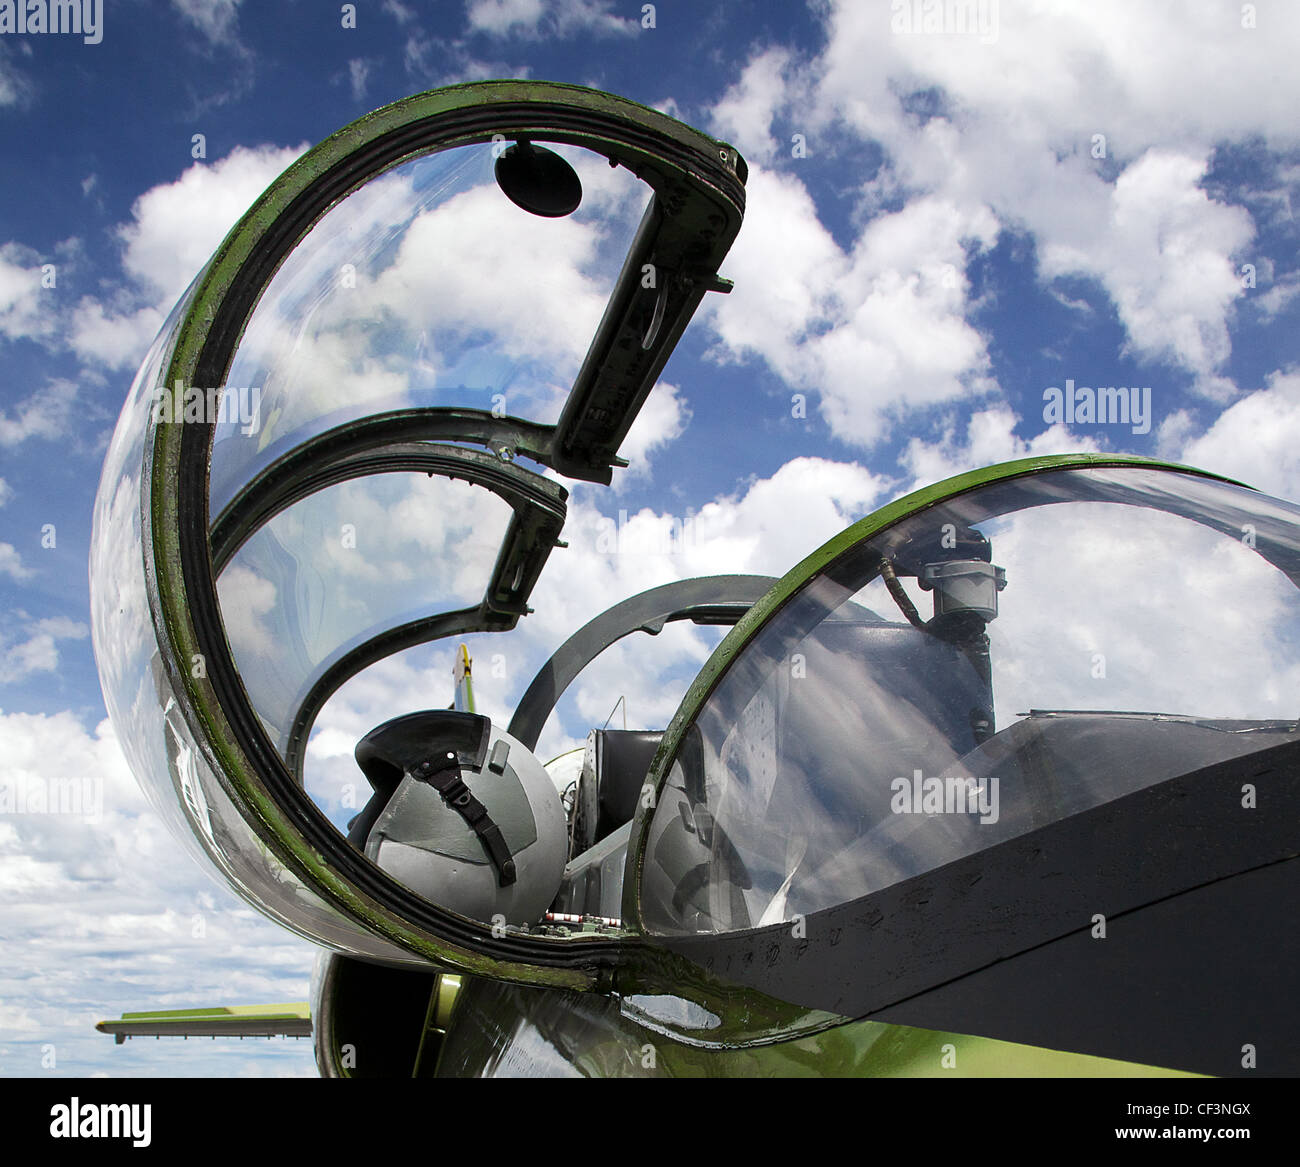 cockpit of jet albatross - Stock Image